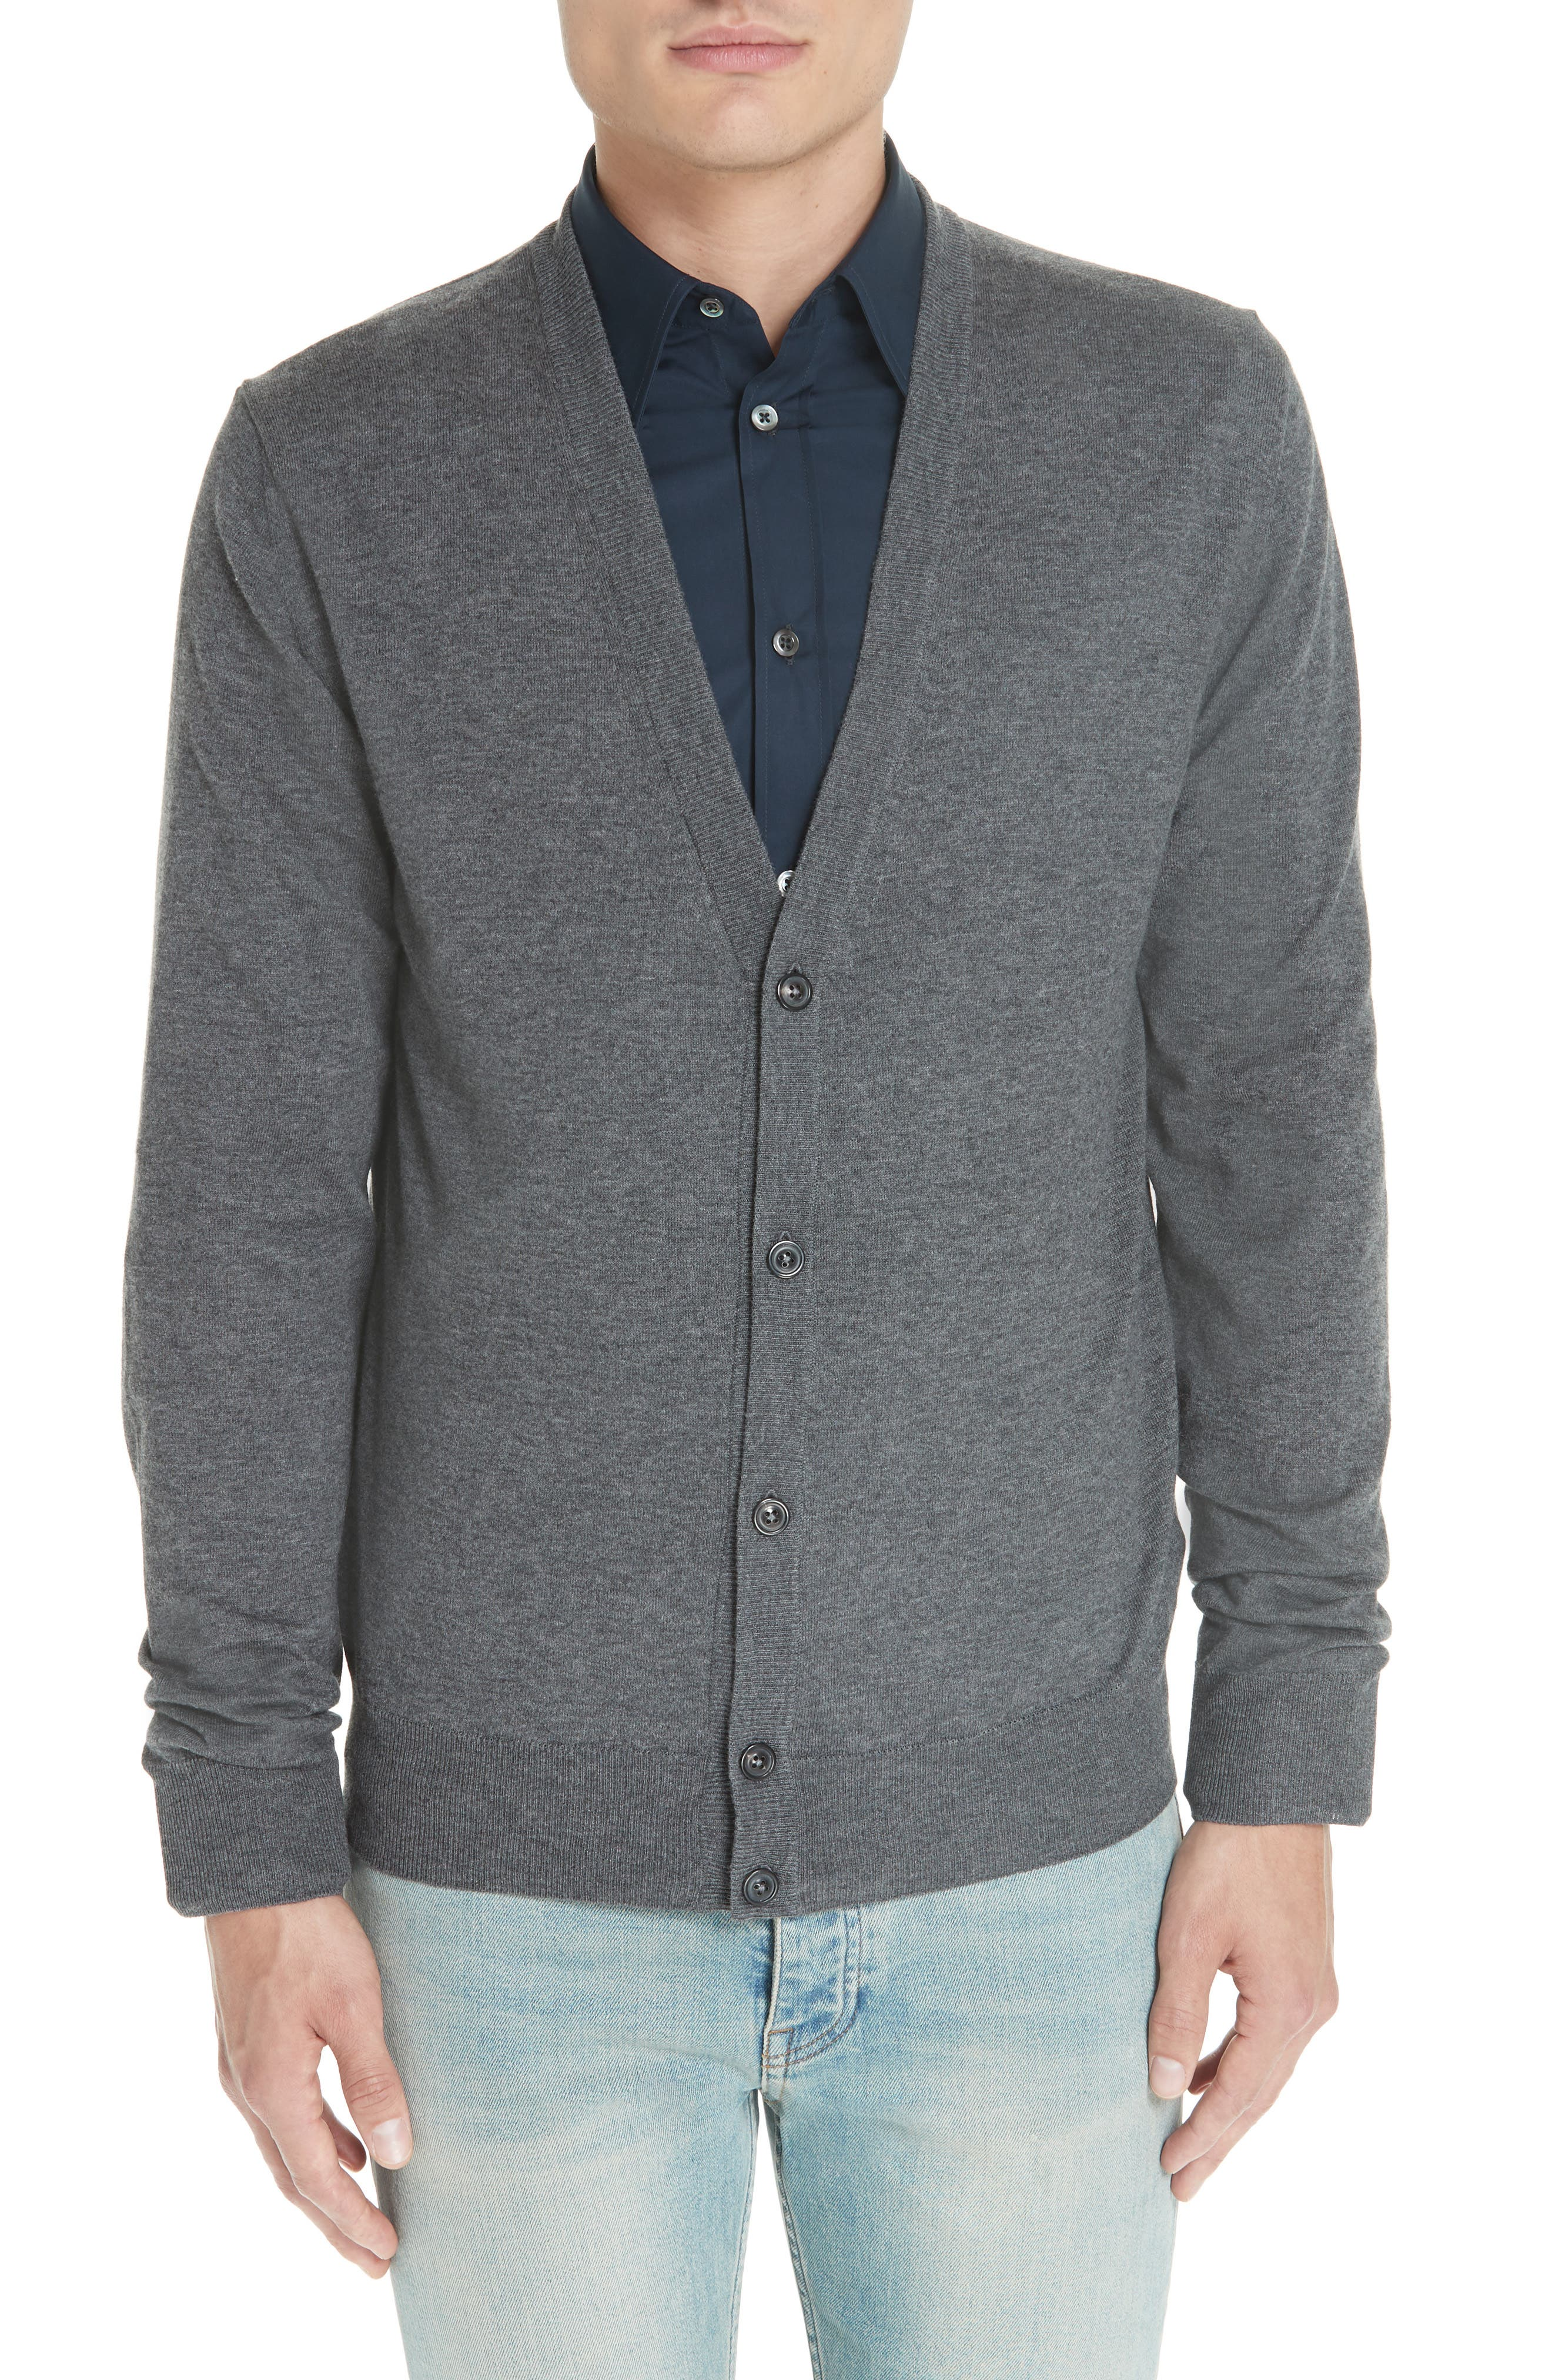 Maison Margiela Wool & Cotton Cardigan, Grey